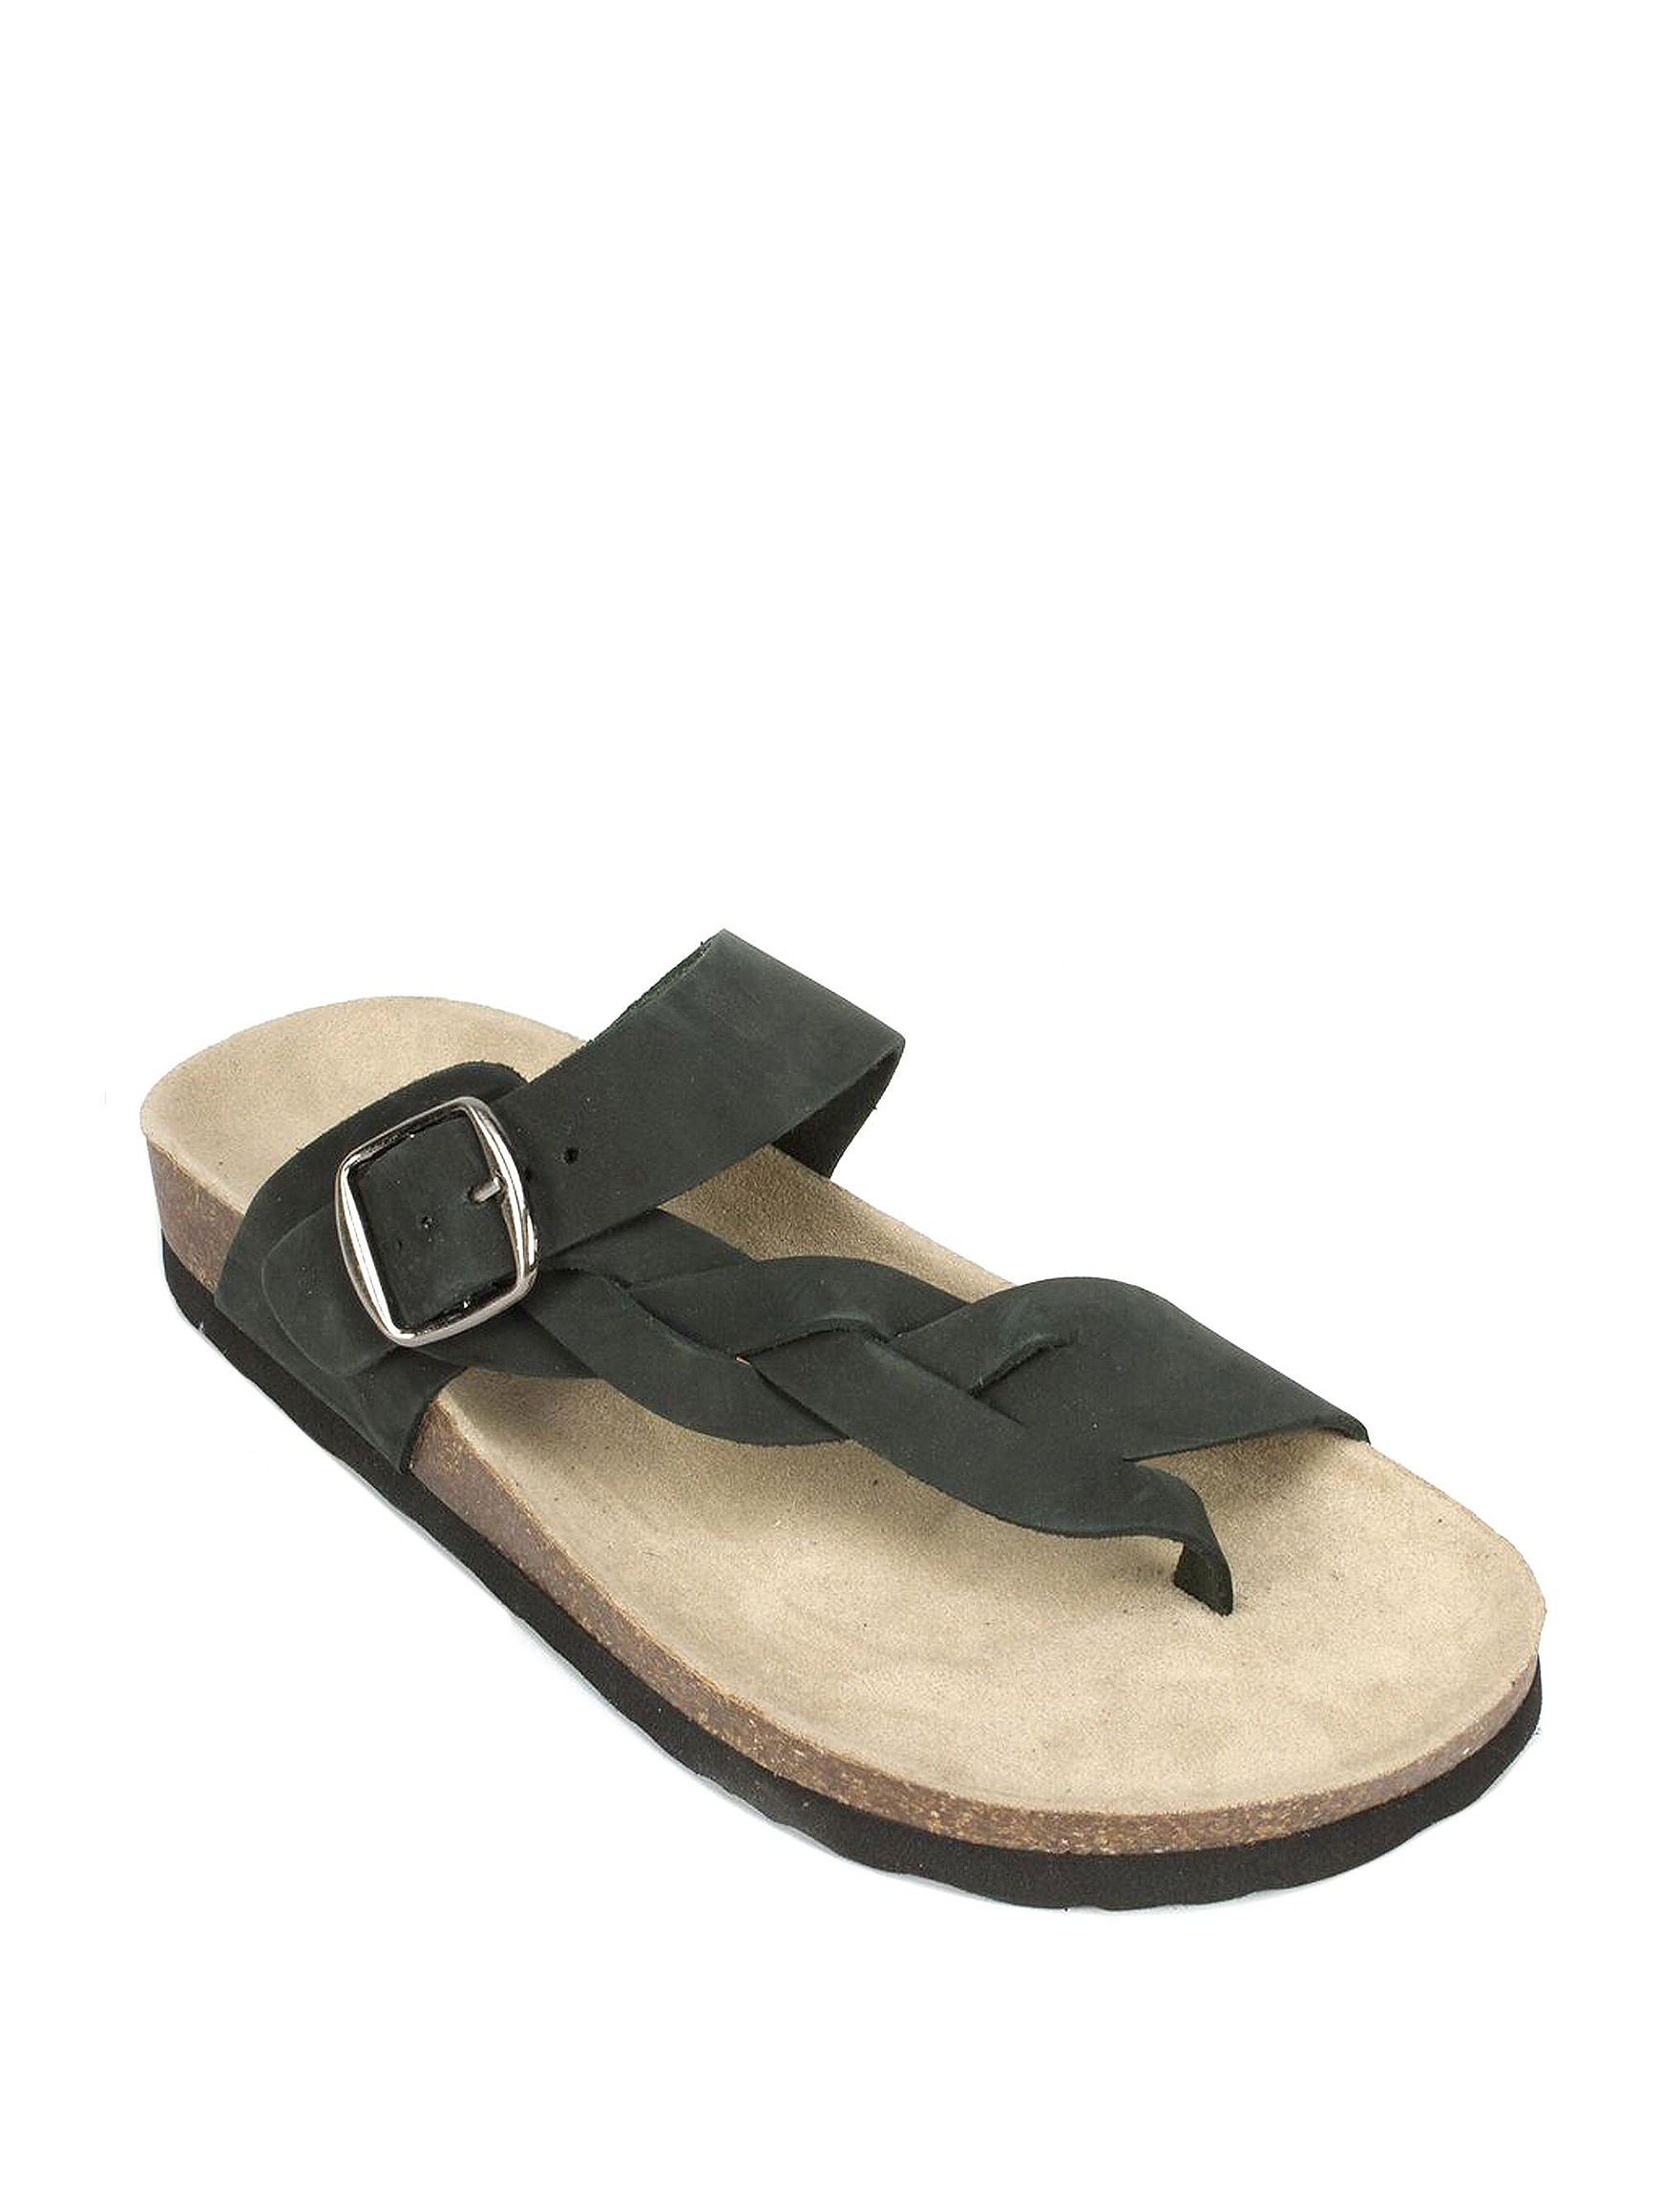 White Mountain Black Flat Sandals Slide Sandals